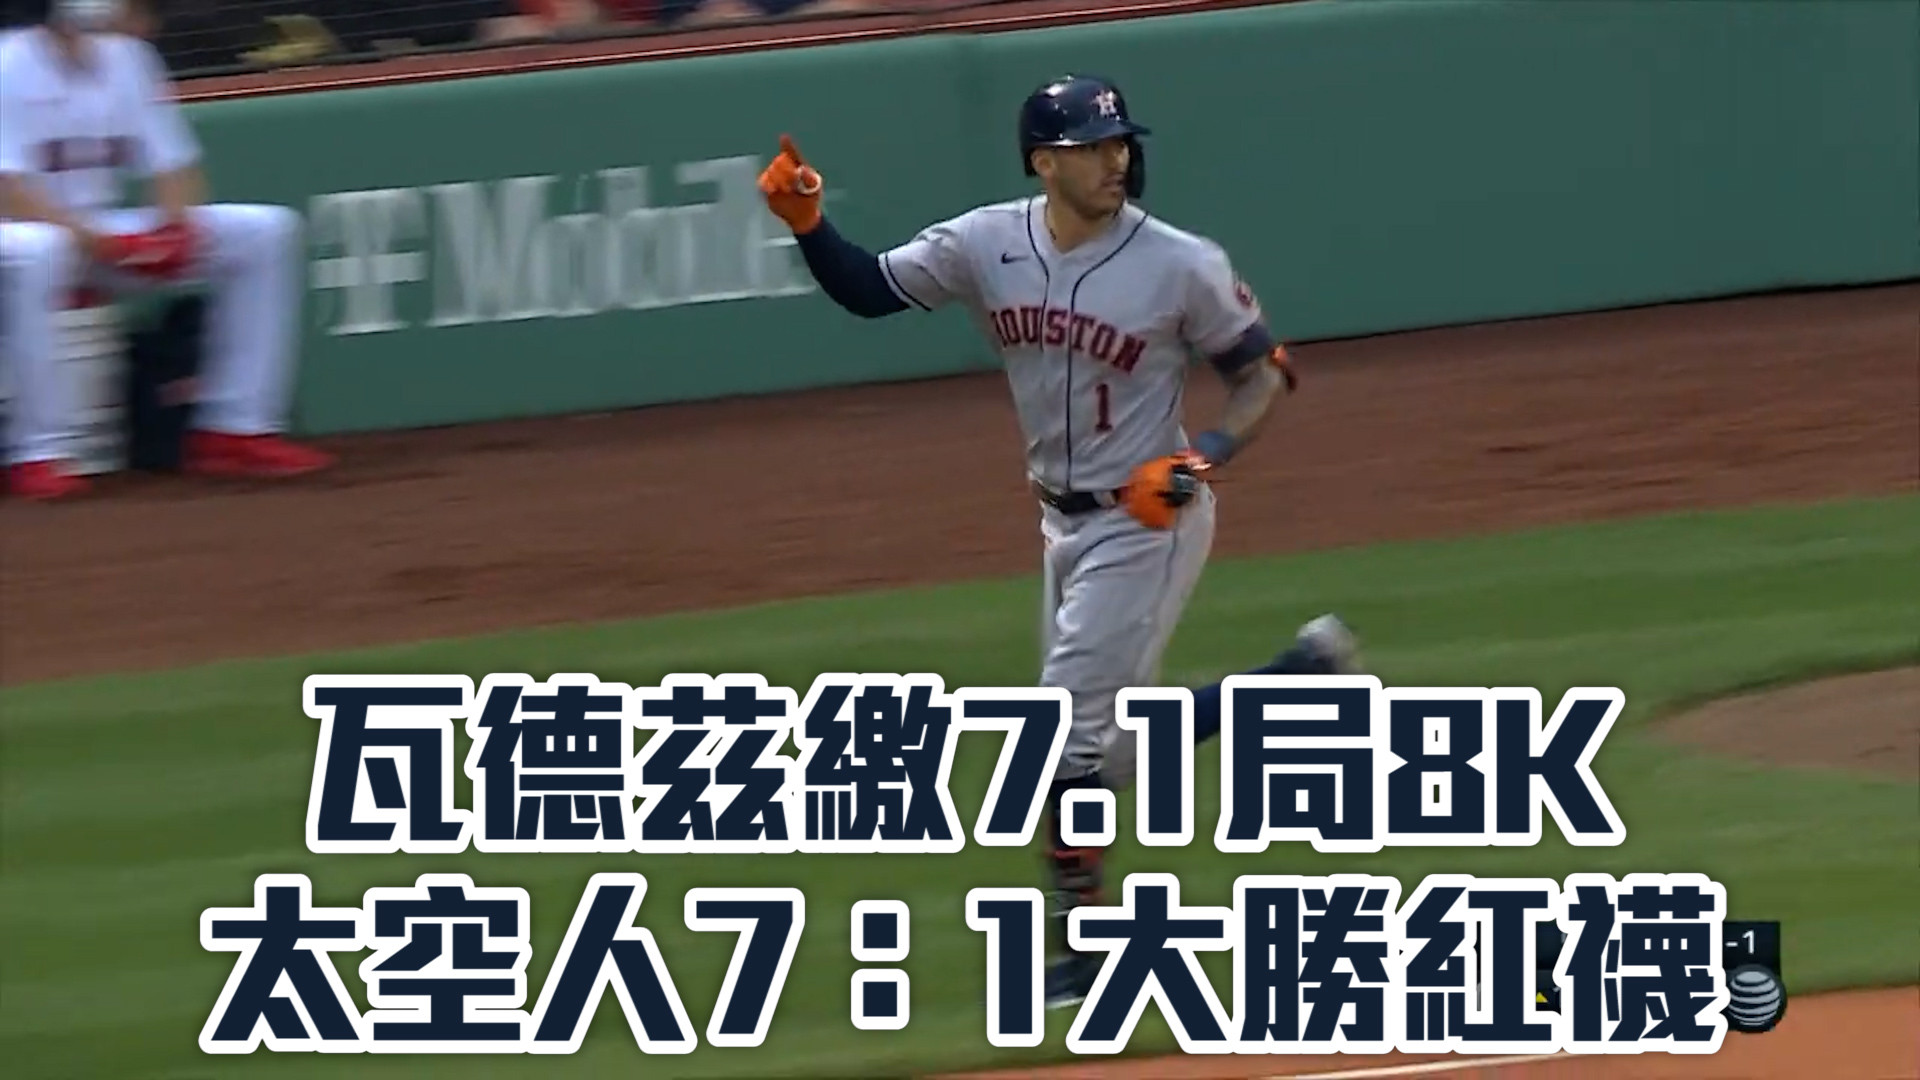 【MLB看愛爾達】瓦德茲7.1局飆8K 太空人7:1大勝紅襪 06/09